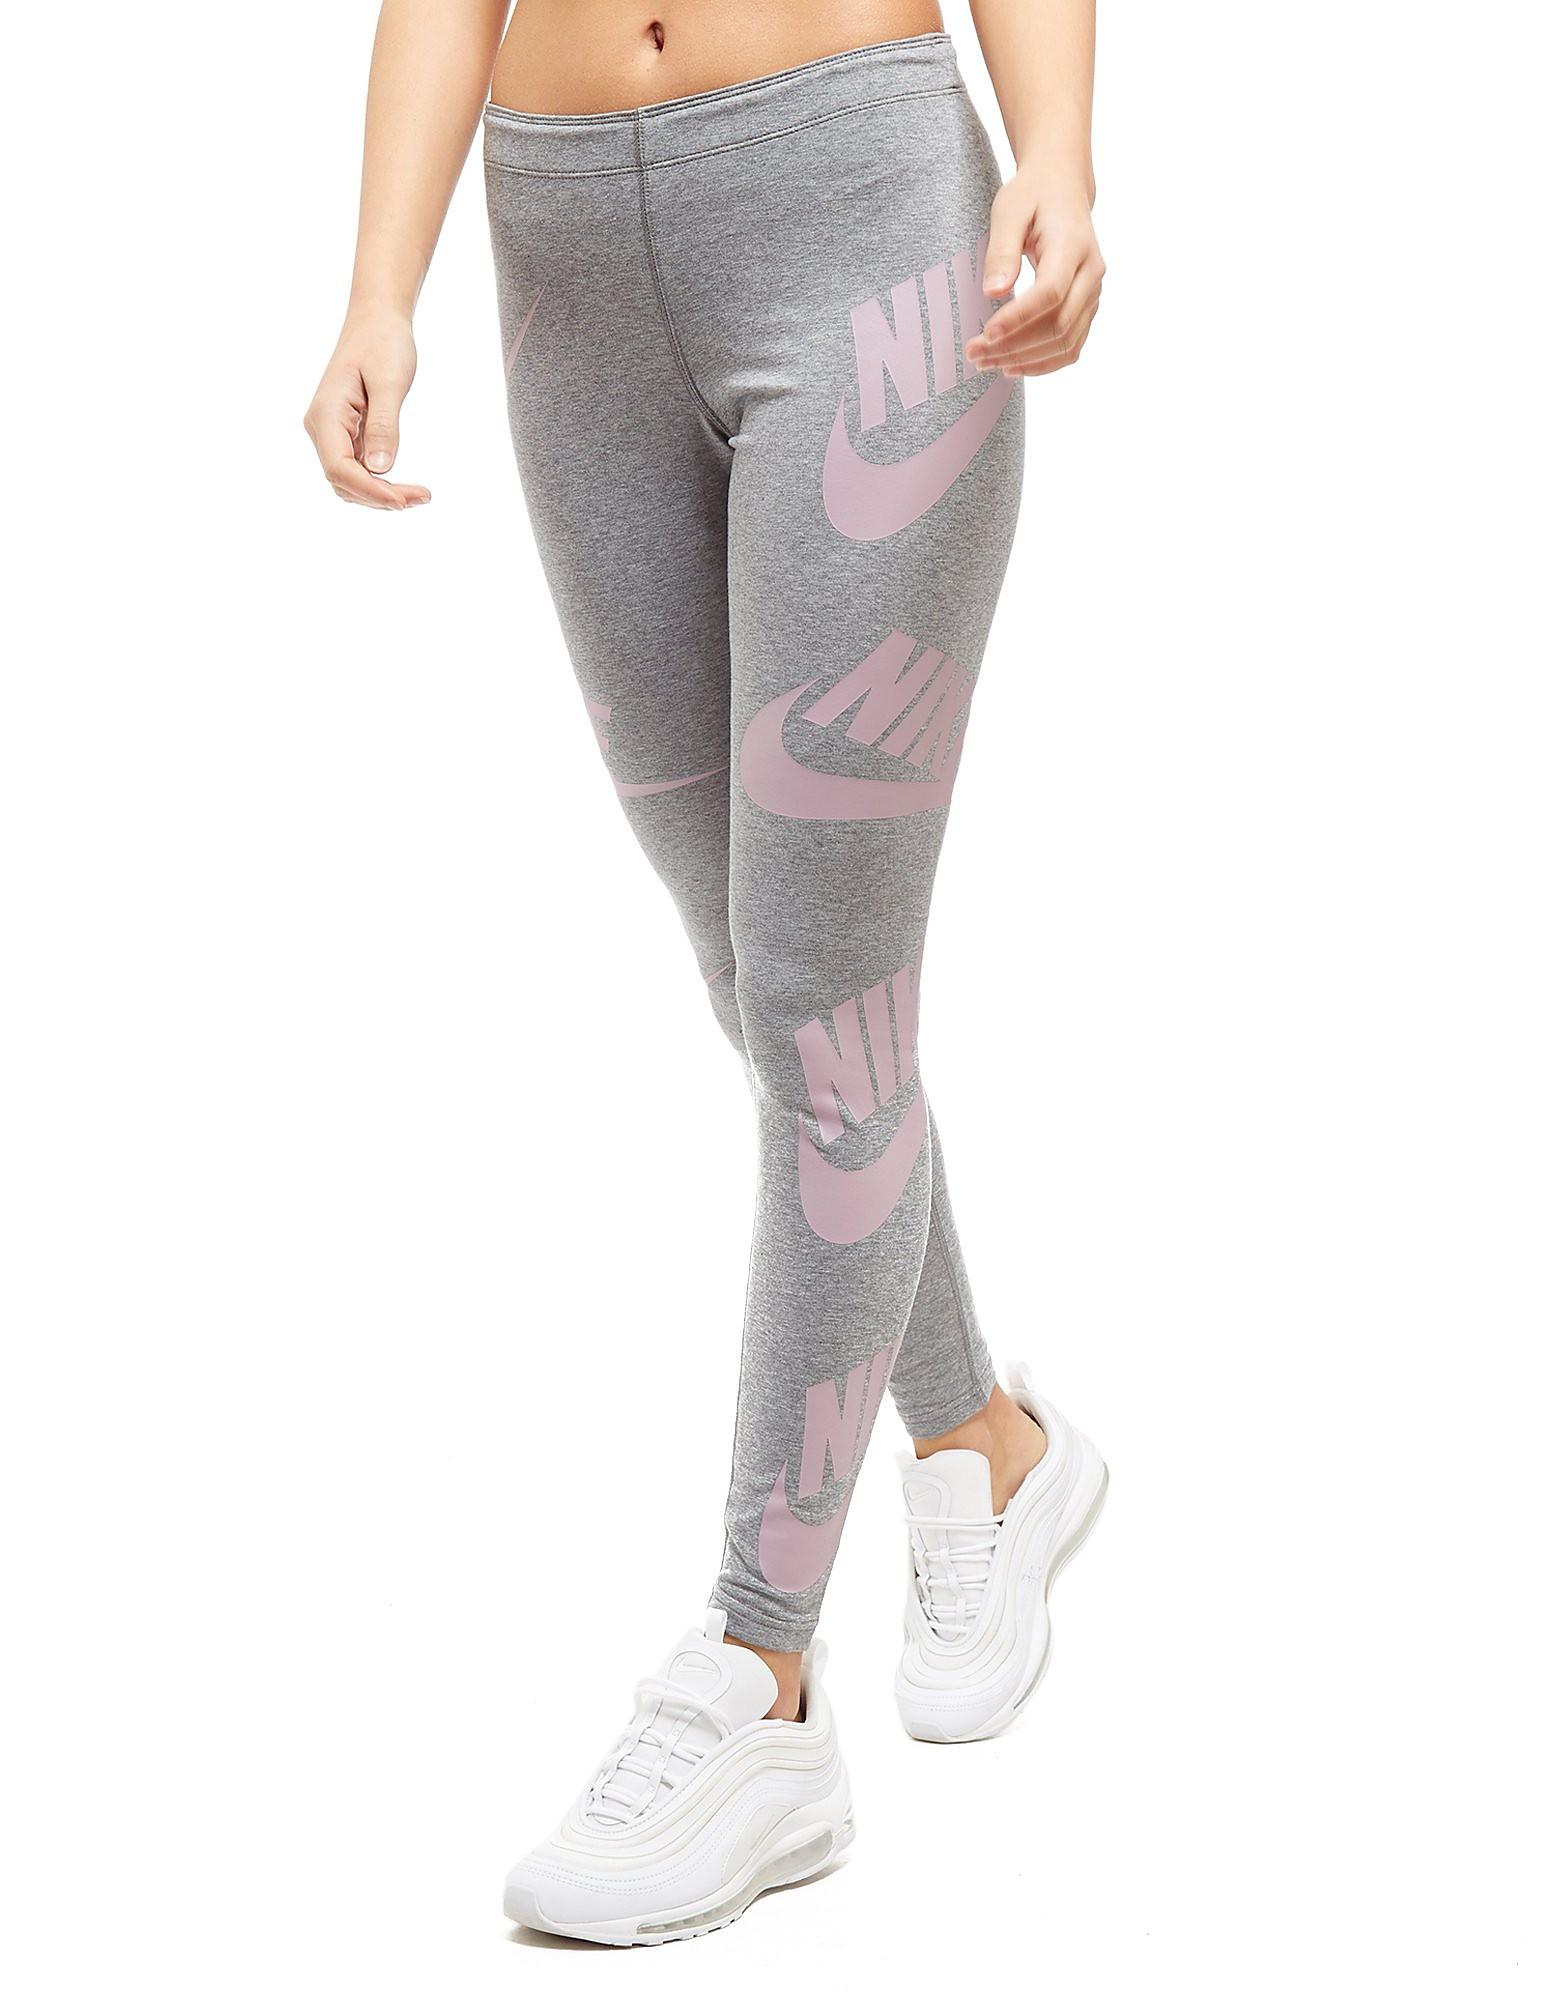 Nike Futura All Over Print Leggings